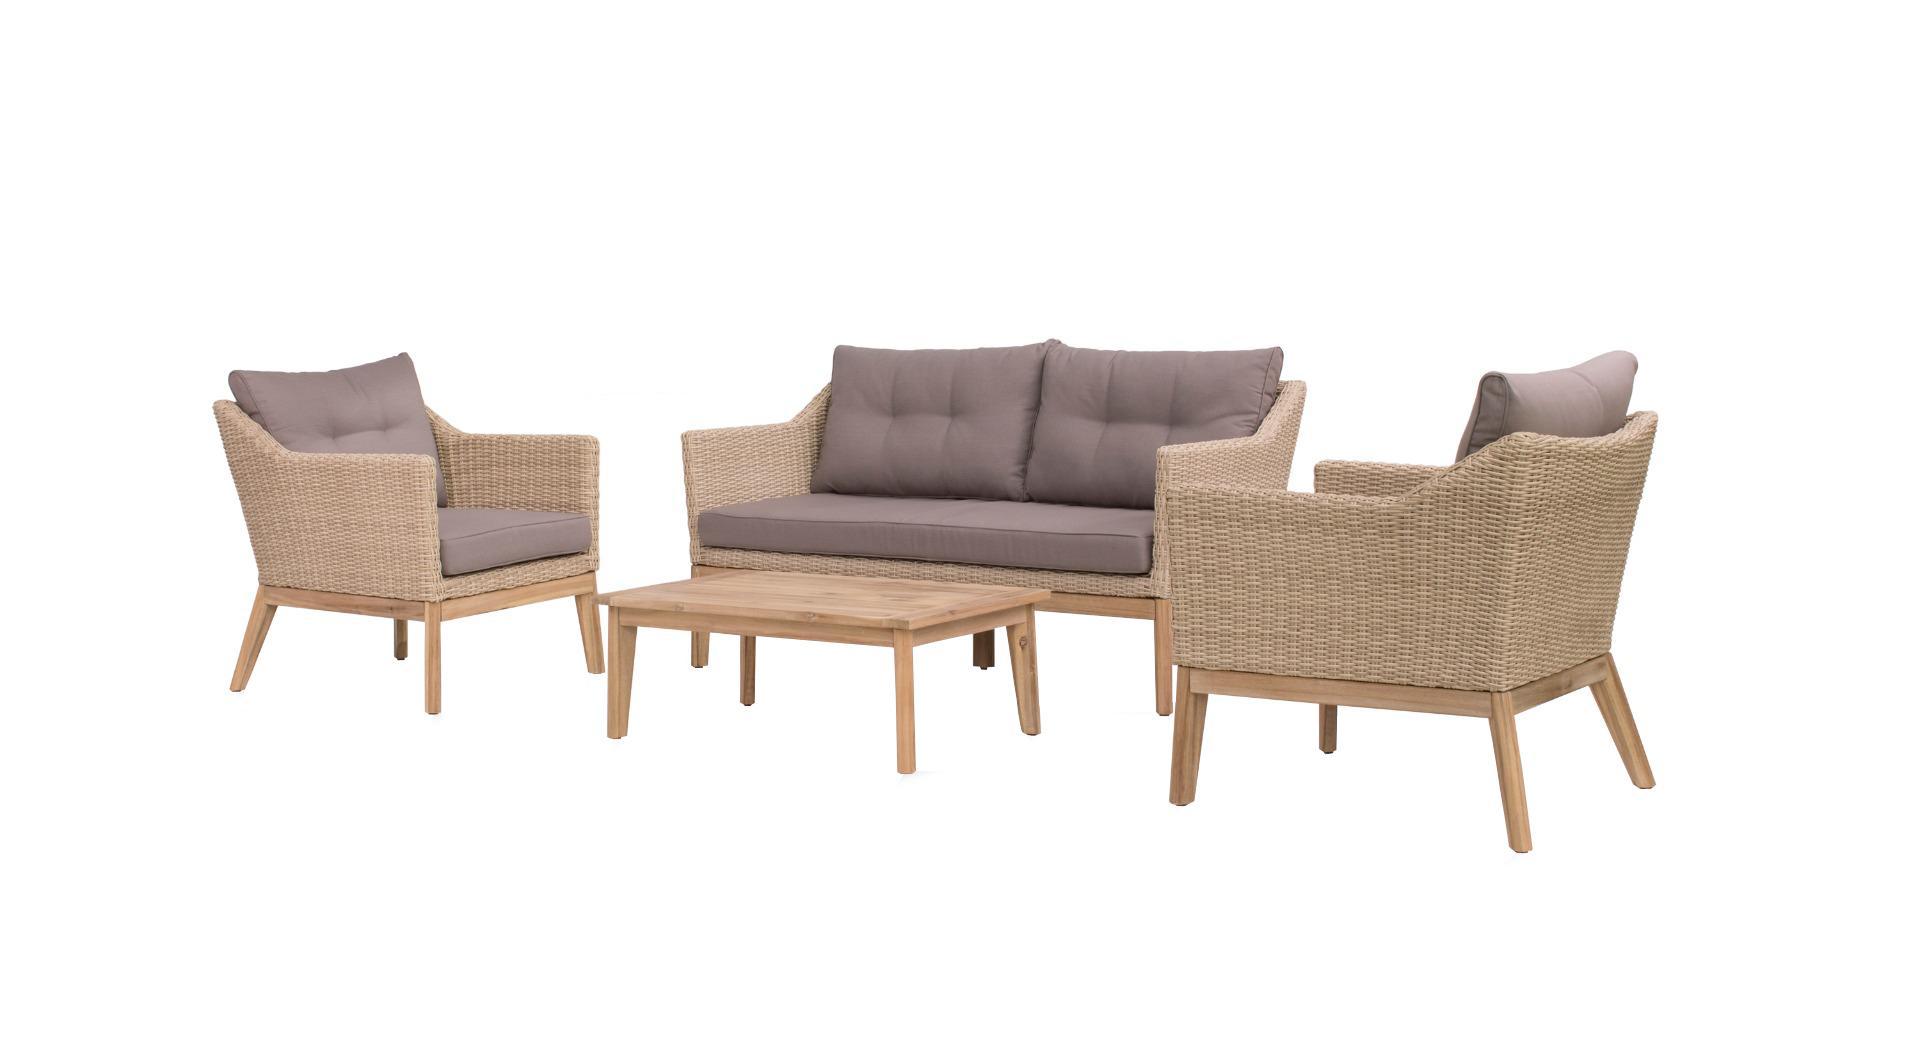 Larissa lounge set 4 pcs (2x chair 1x bench 157cm 1x table 90x60x34cm)